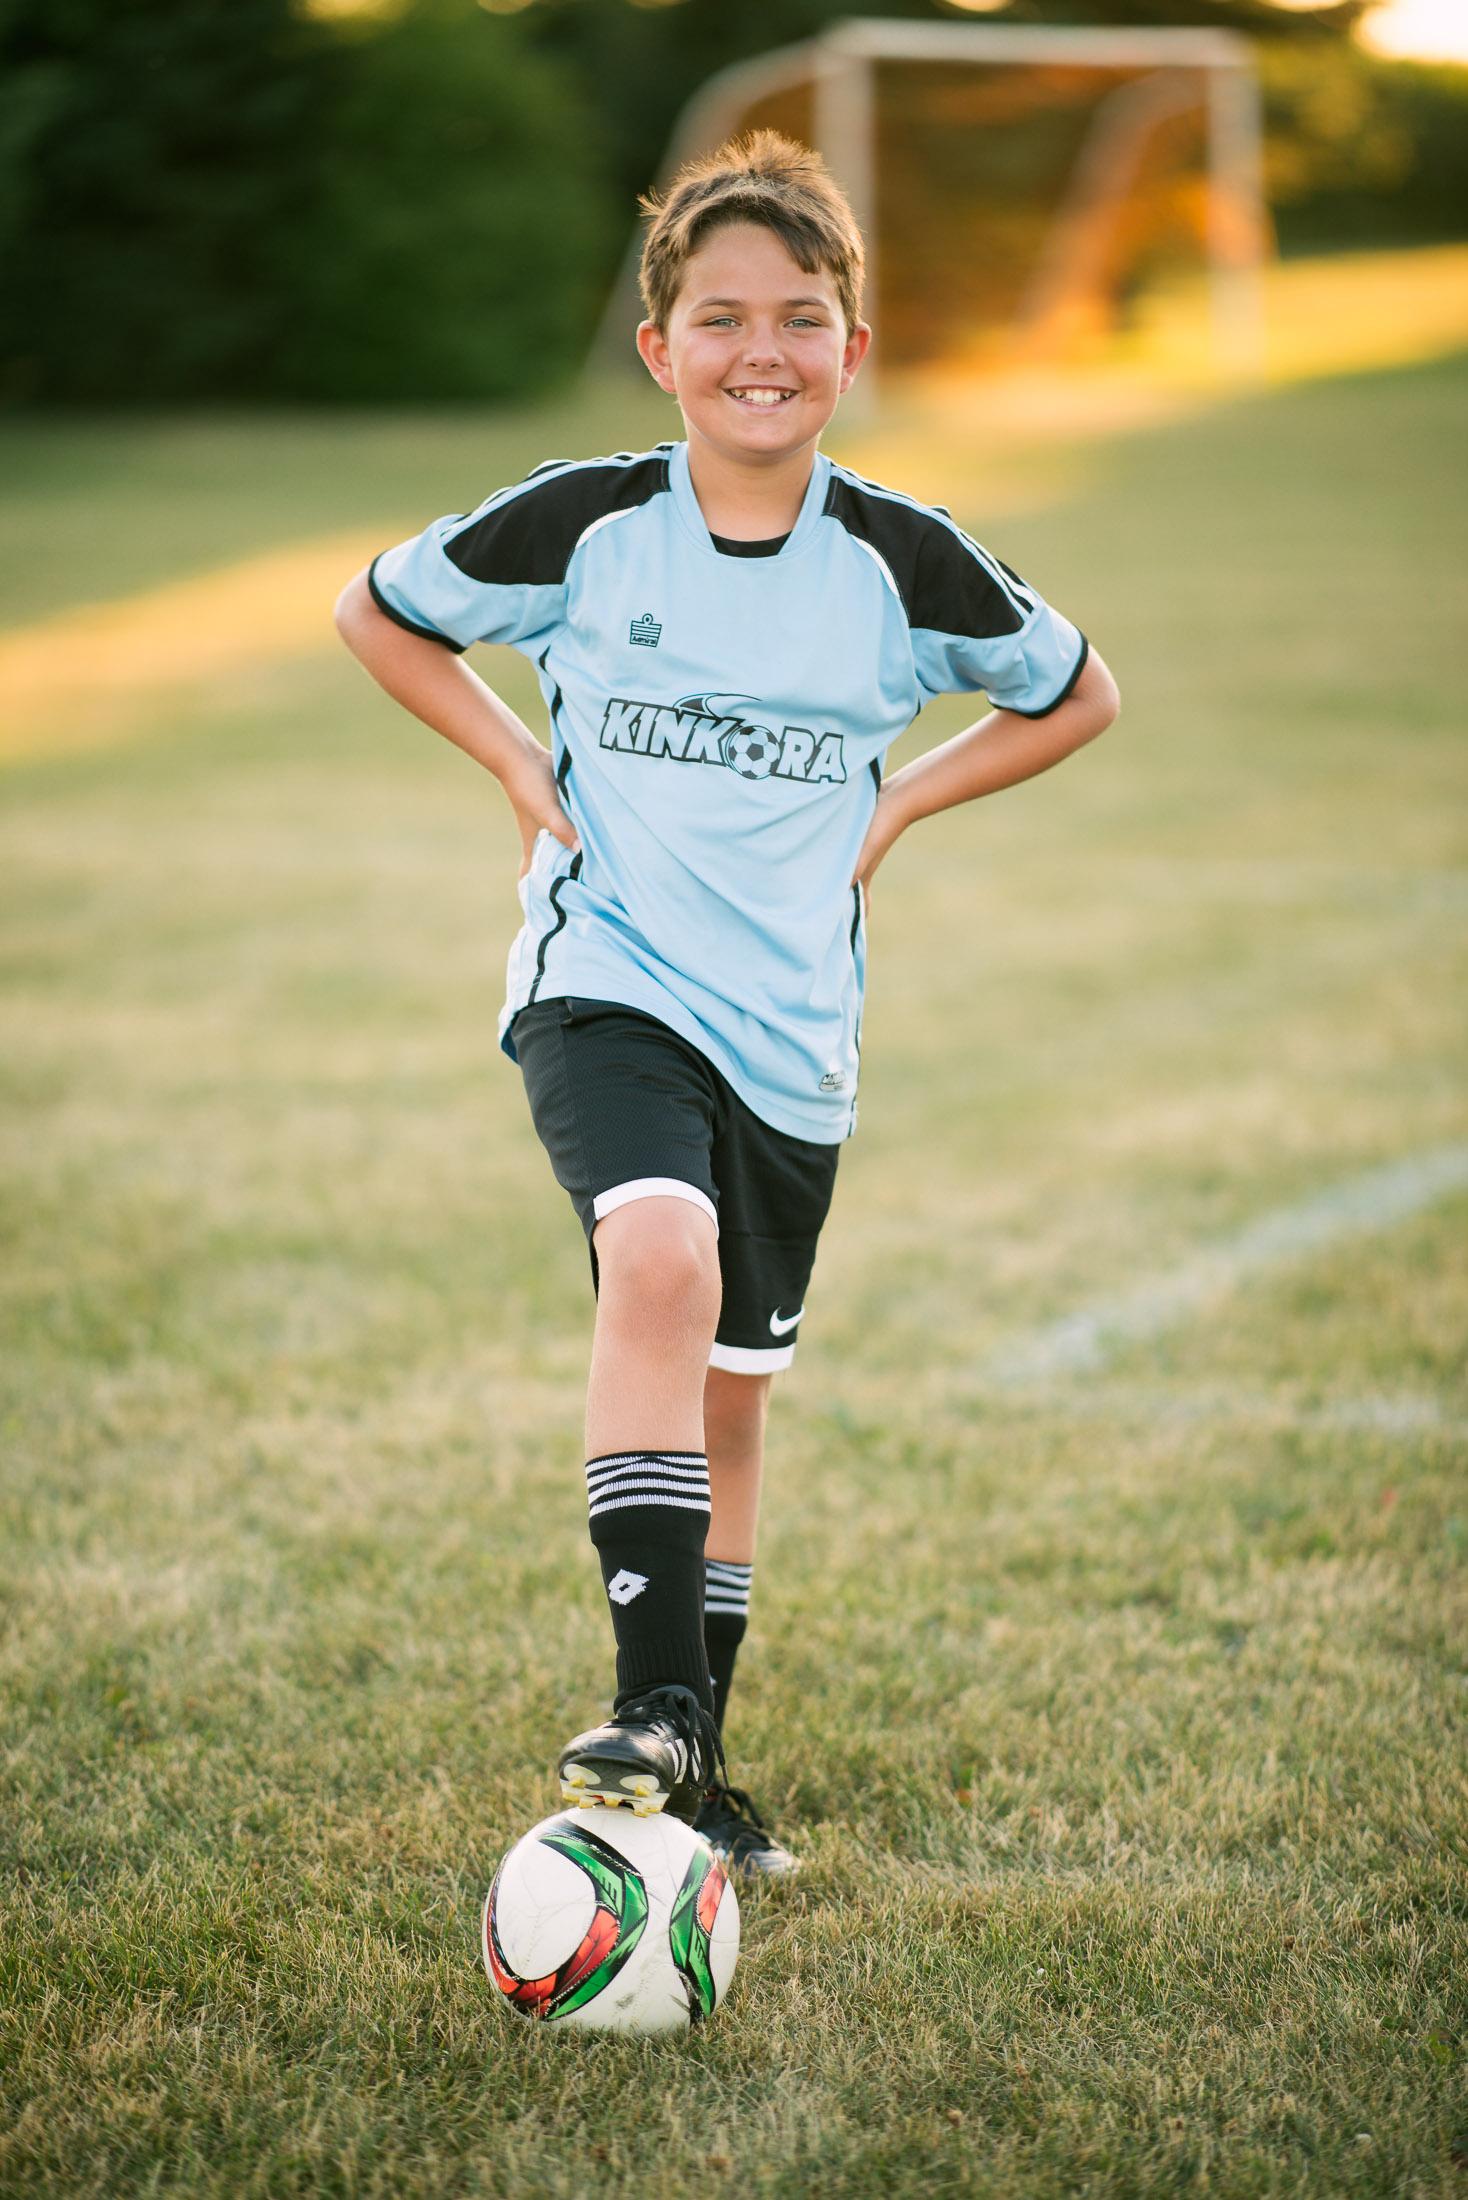 Kinkora-Soccer-Photos-065.jpg